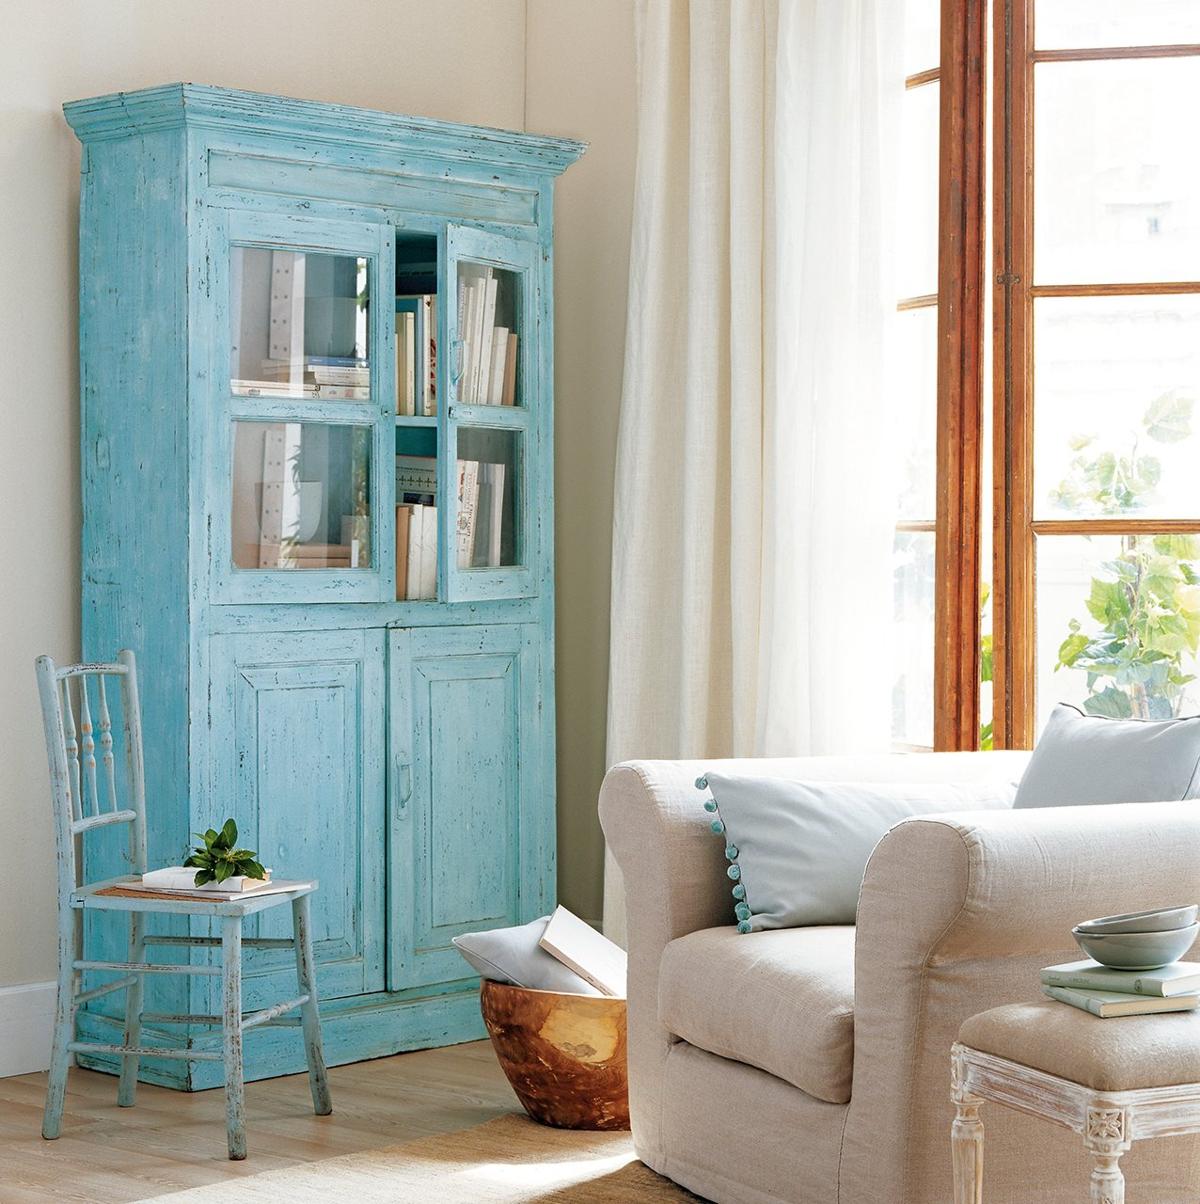 renovar muebles - mueble azul